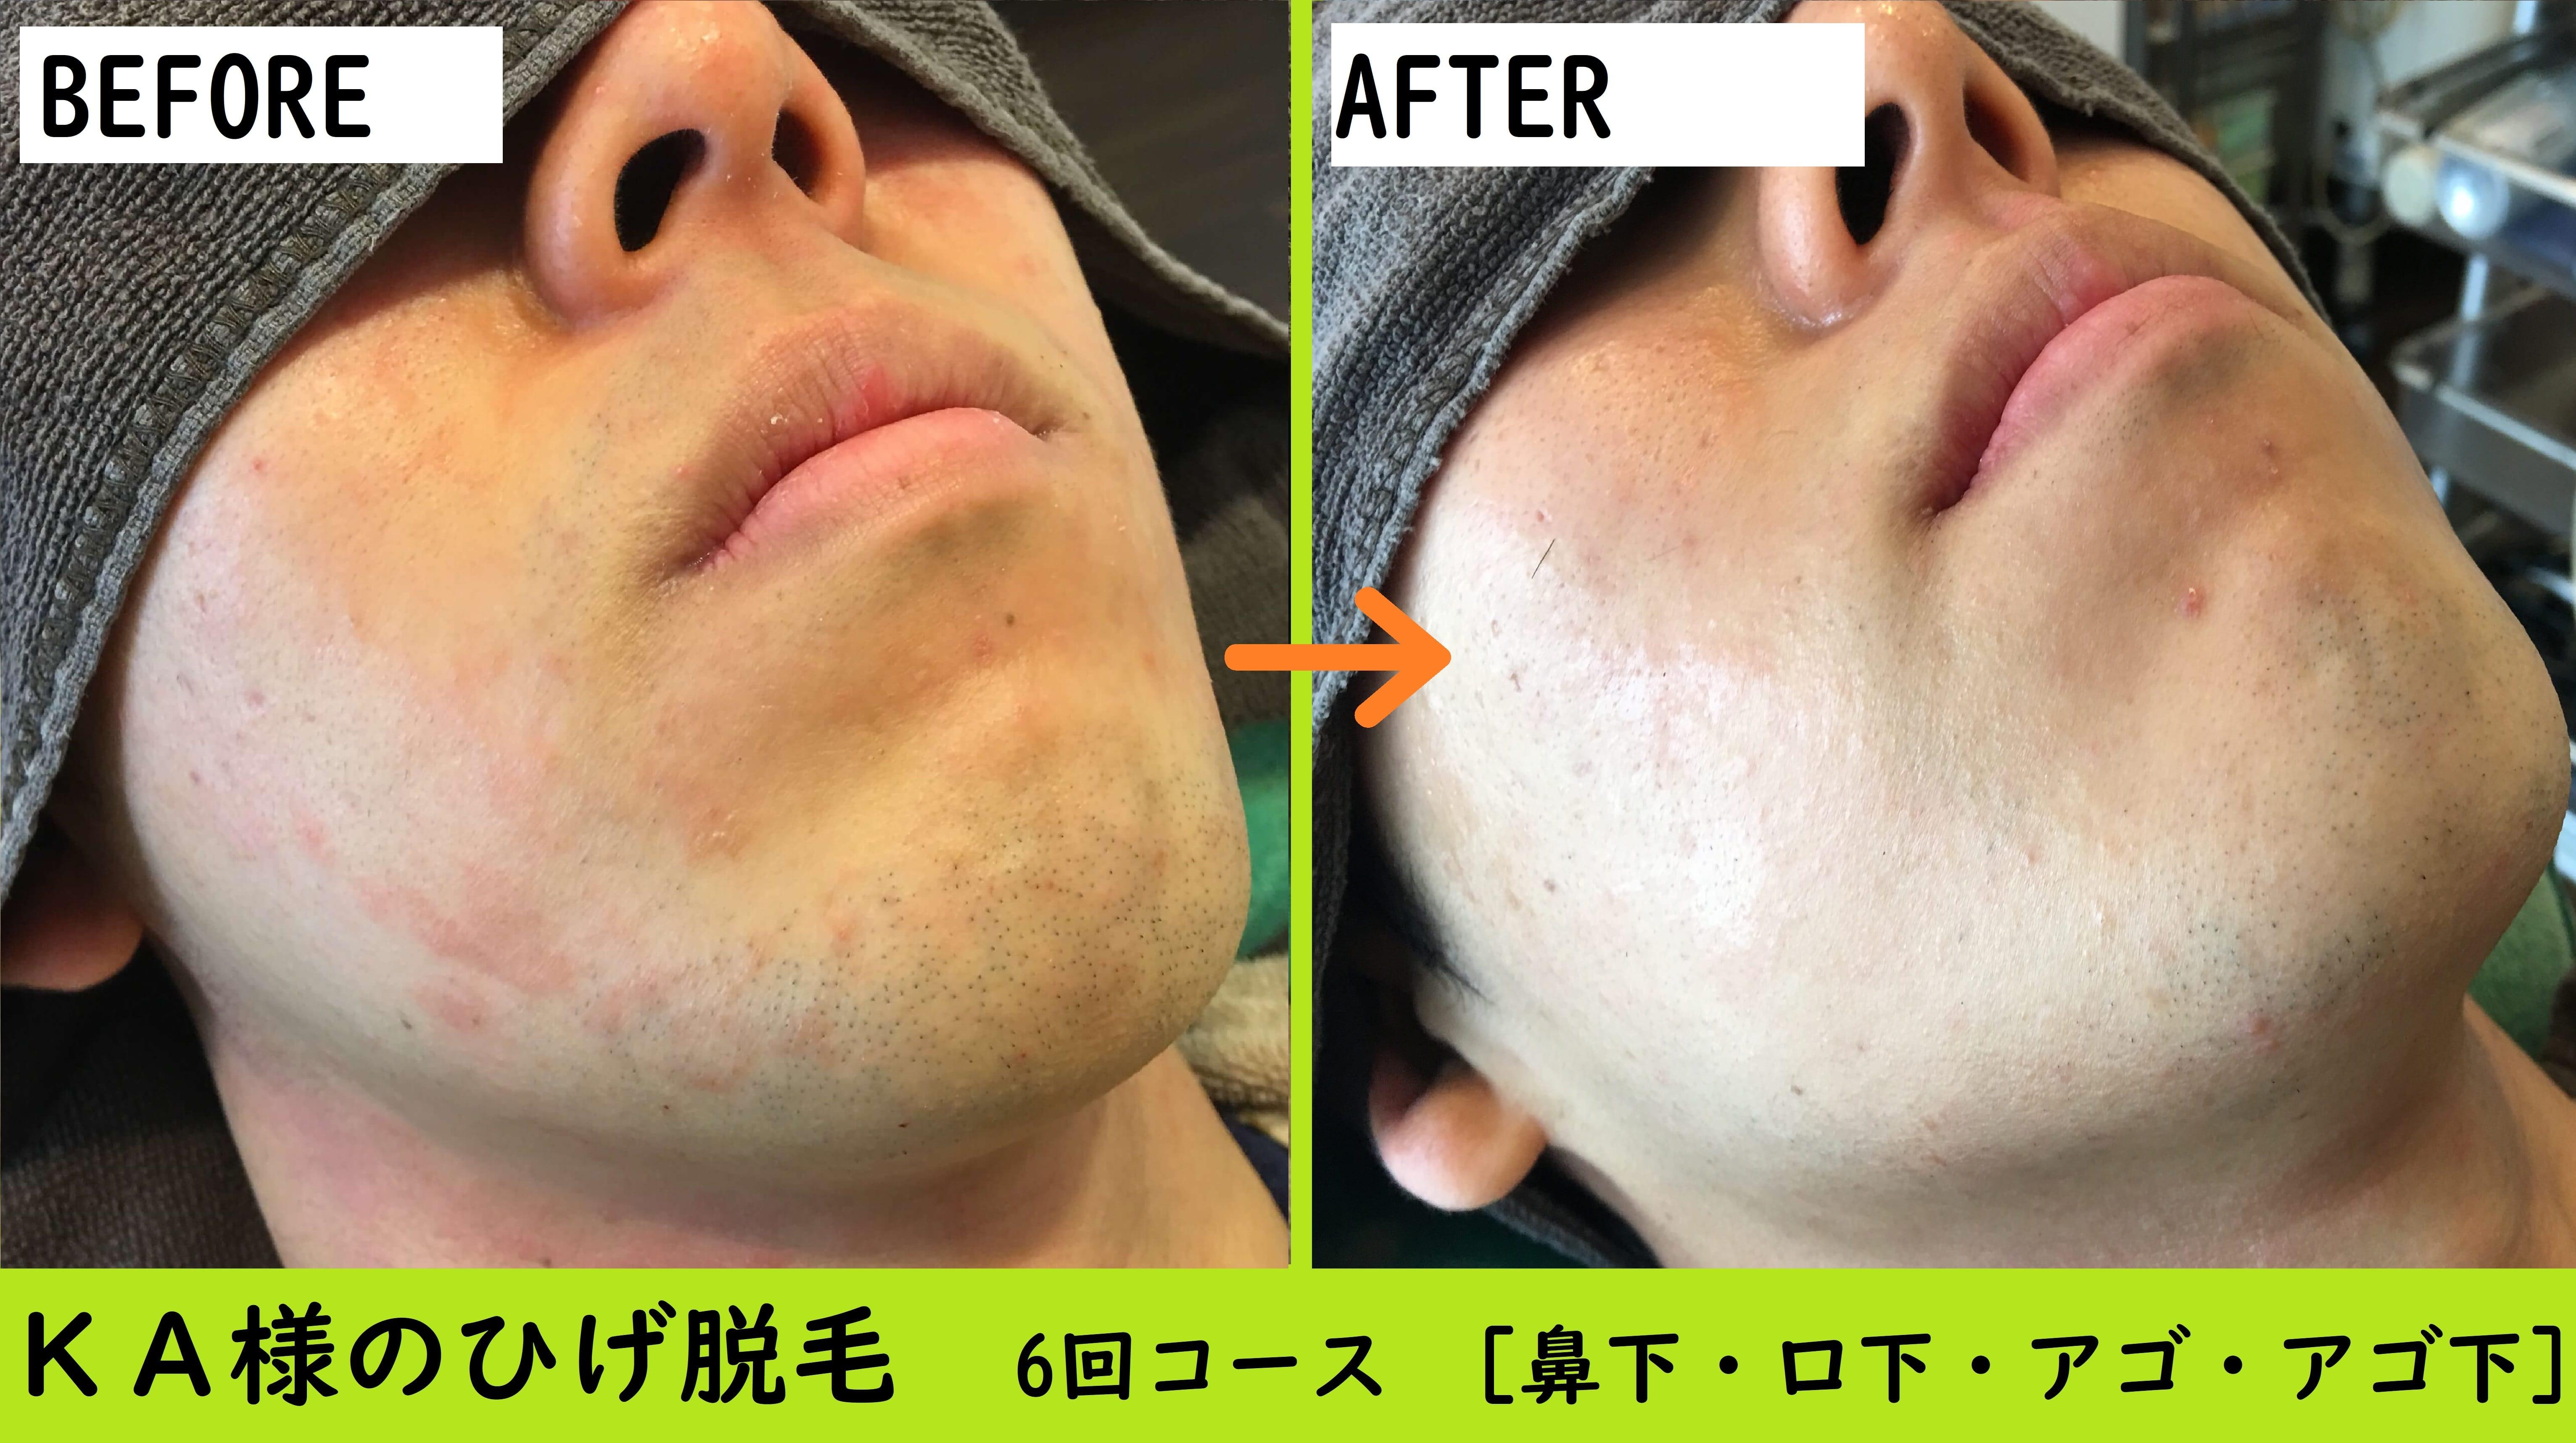 KA様のひげ脱毛完了 (2)